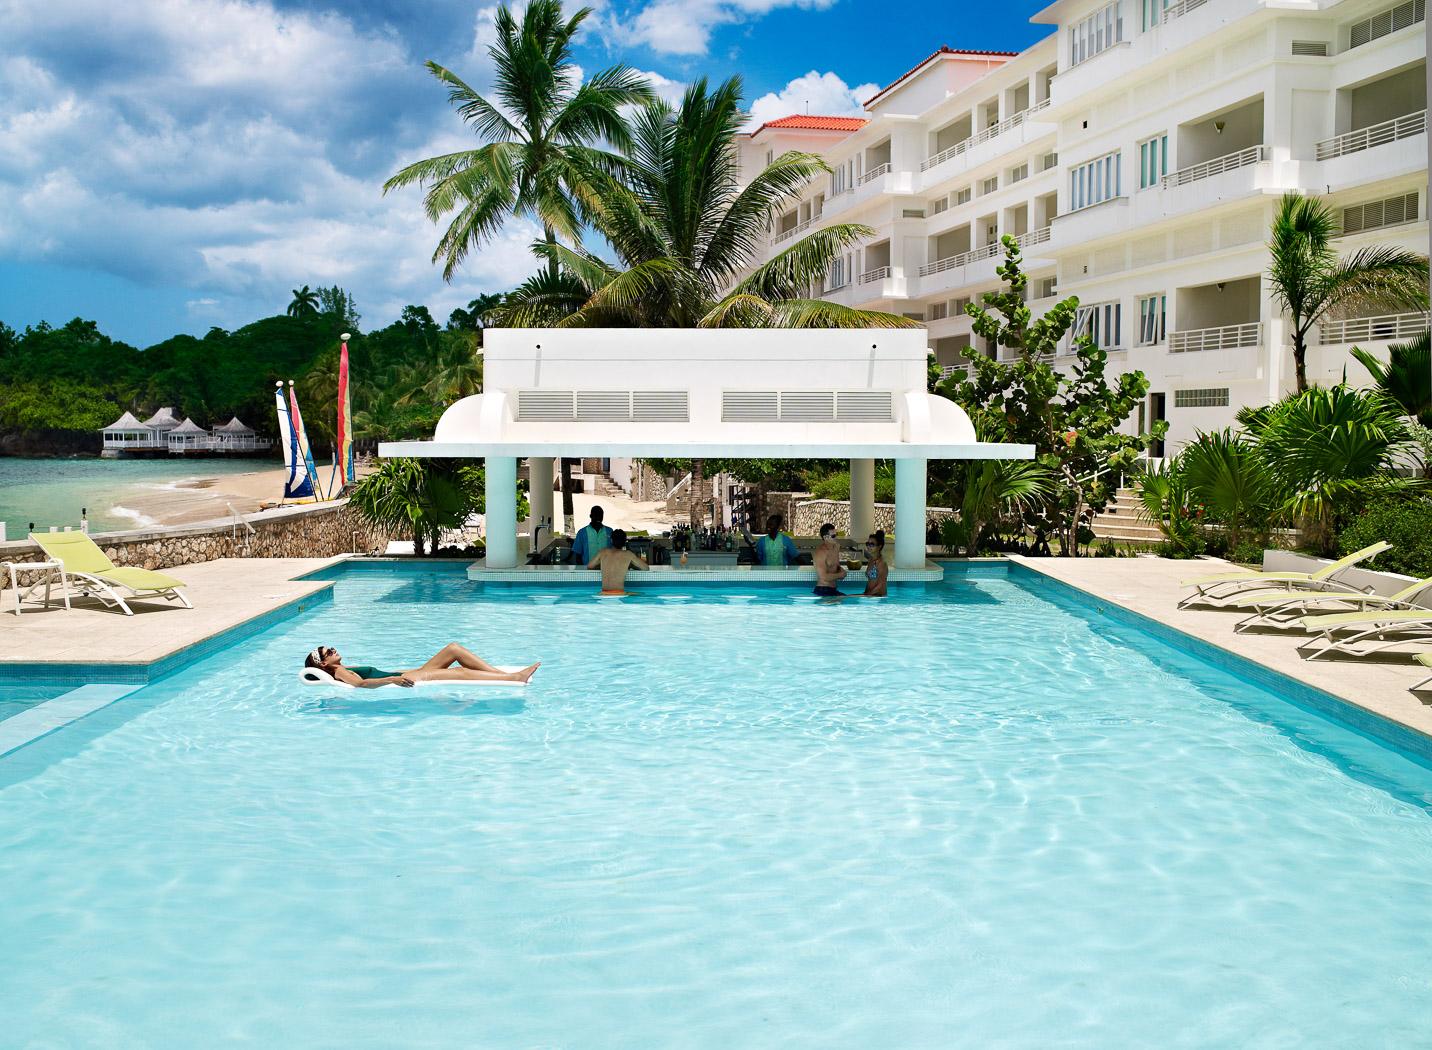 CouplesTowerIsle-Jamaica-11-569412c94cd4c.jpg